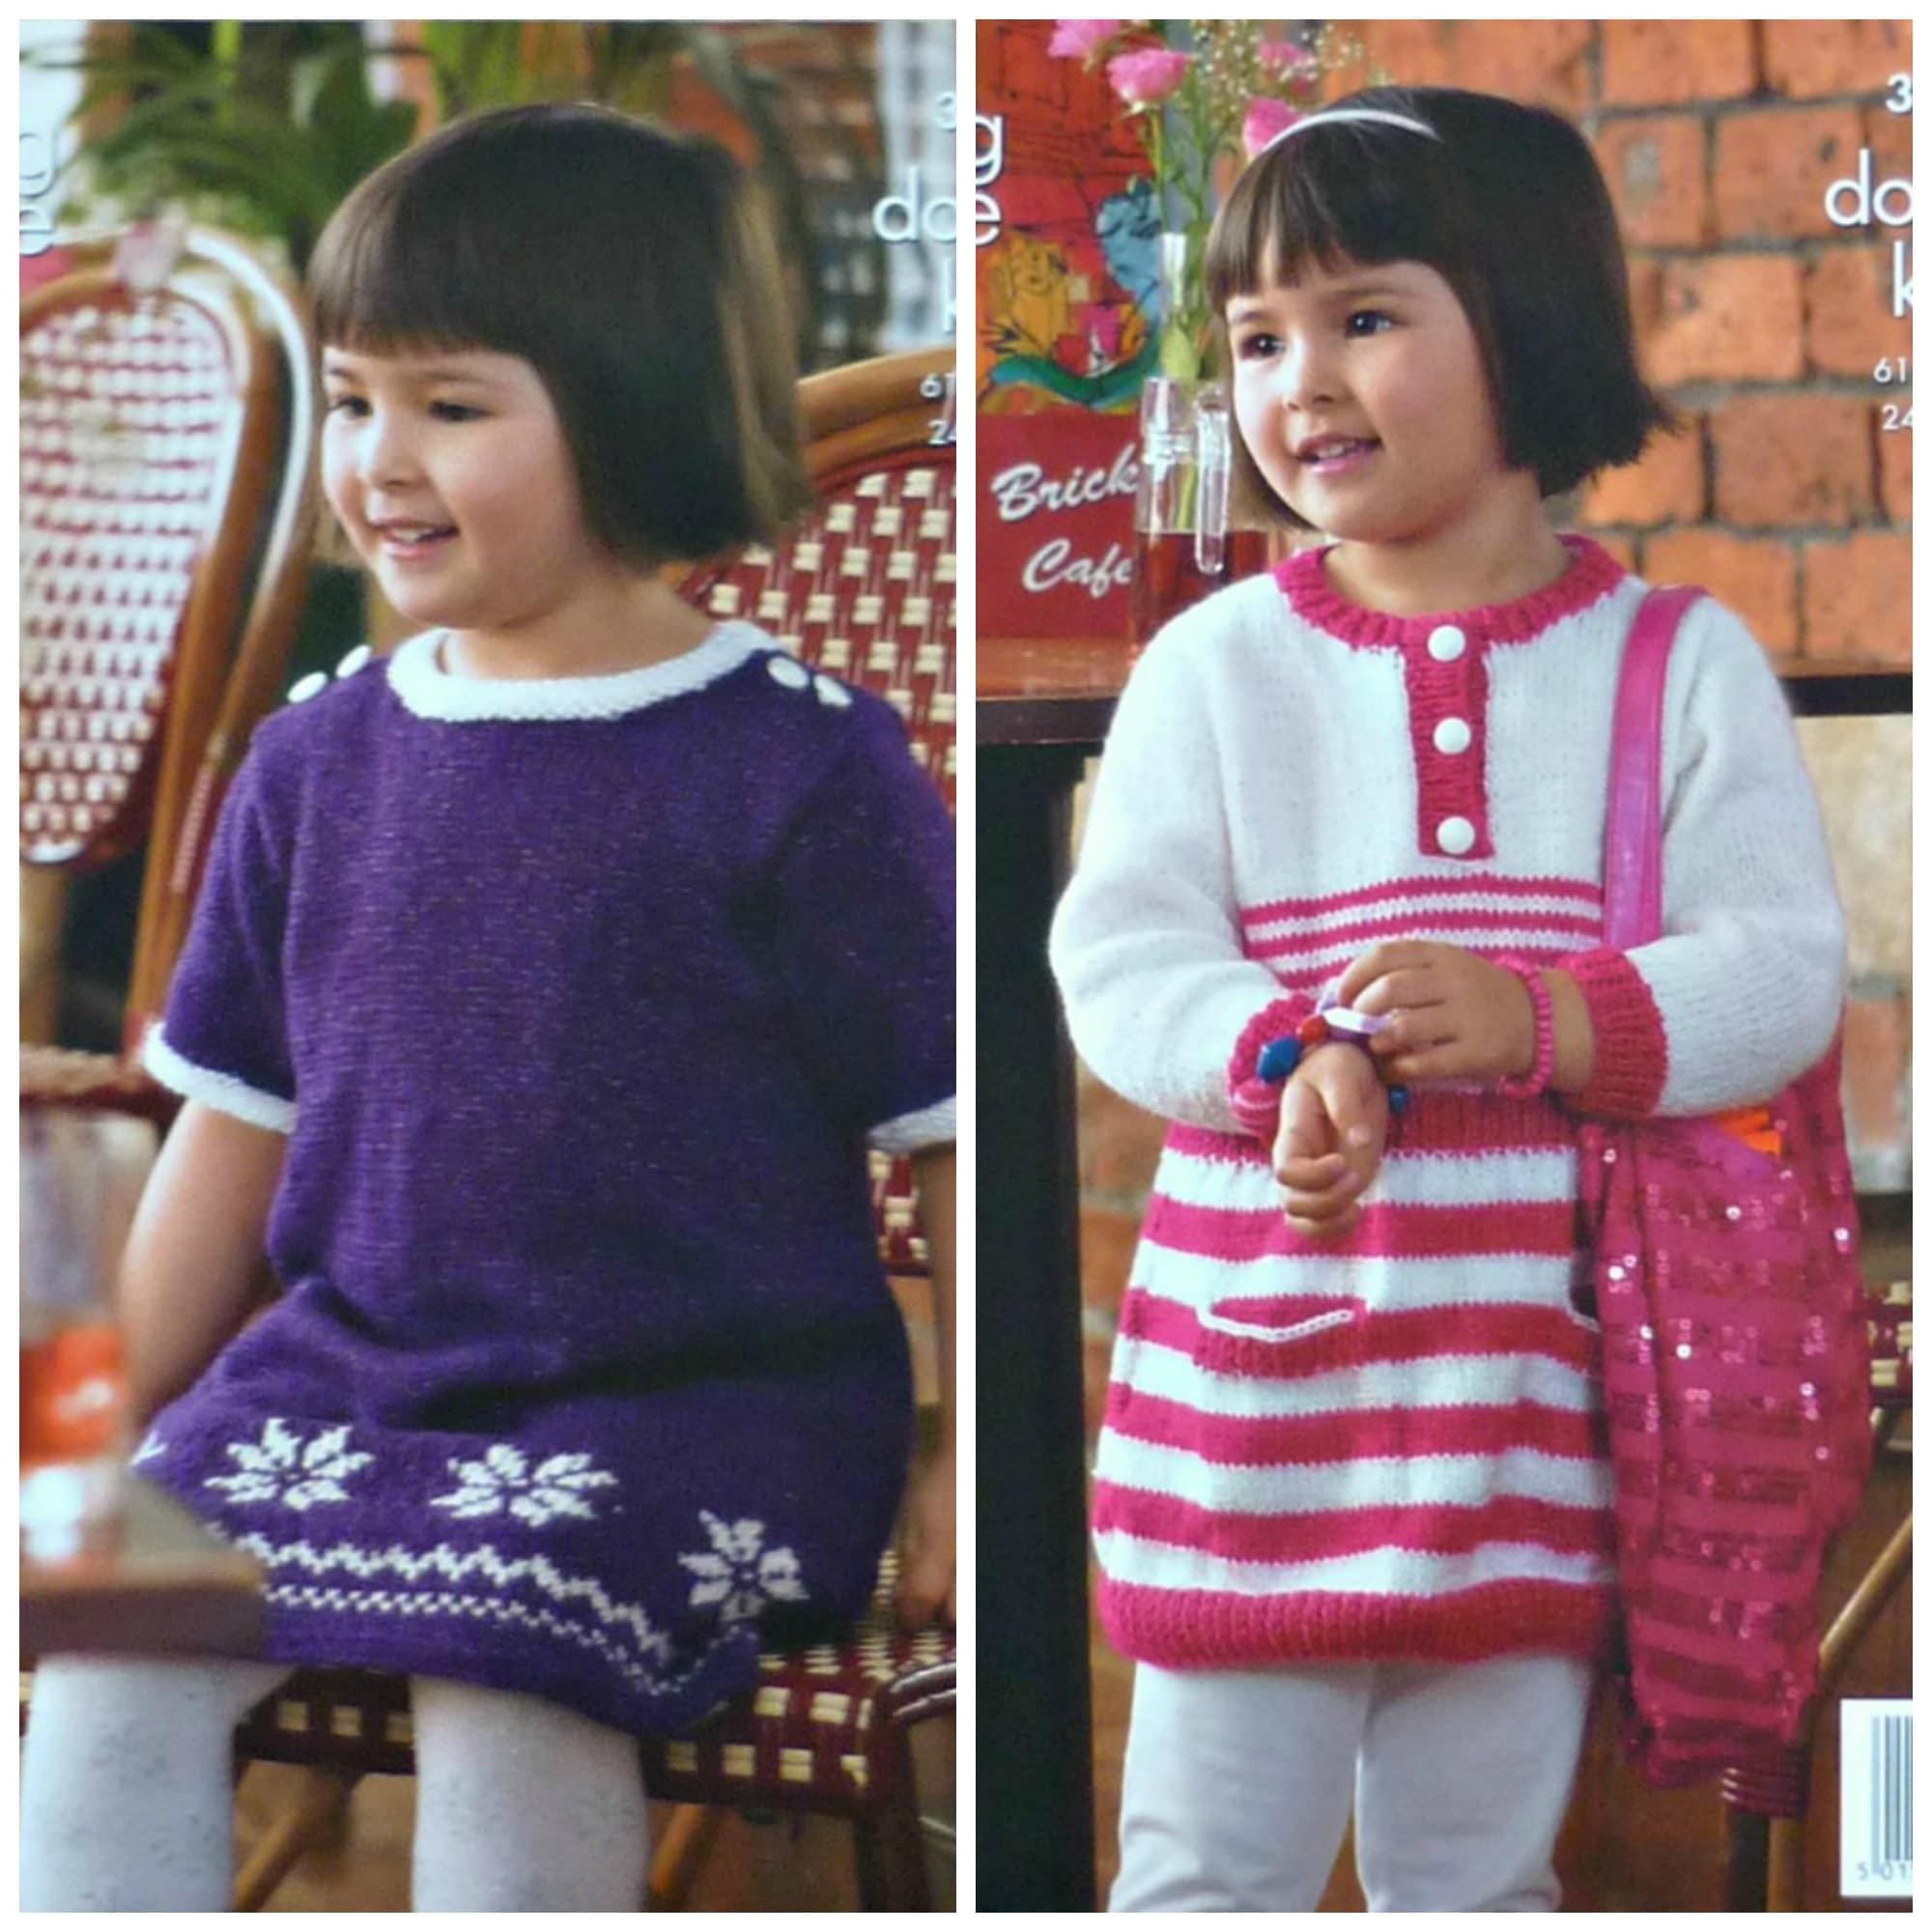 27ece17b3c3 Girls Knitting Pattern K3589 Childrens Round Neck Snowflake or ...